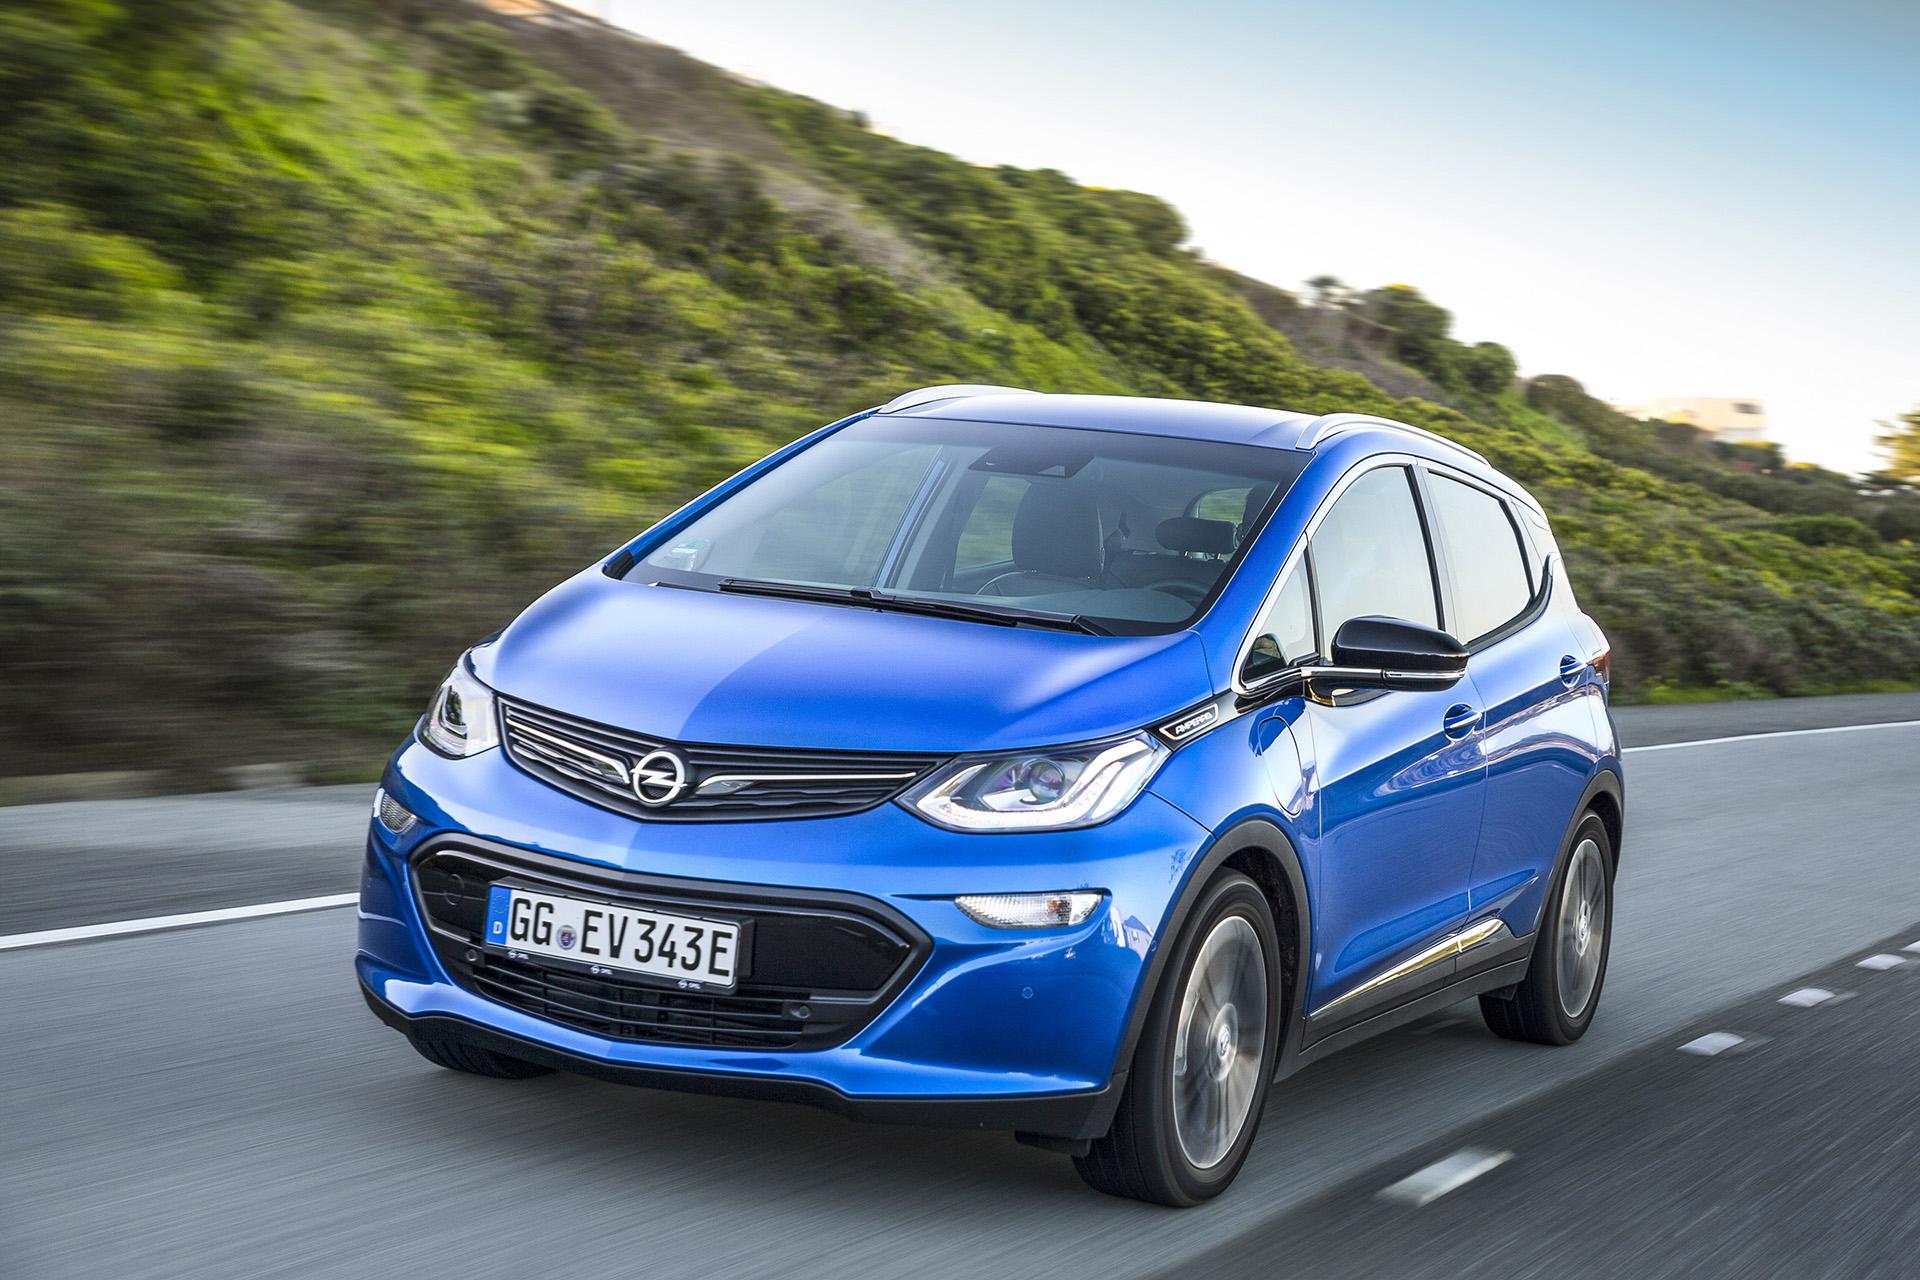 Test de l'Opel Ampera-e, l'anti-Tesla Model 3